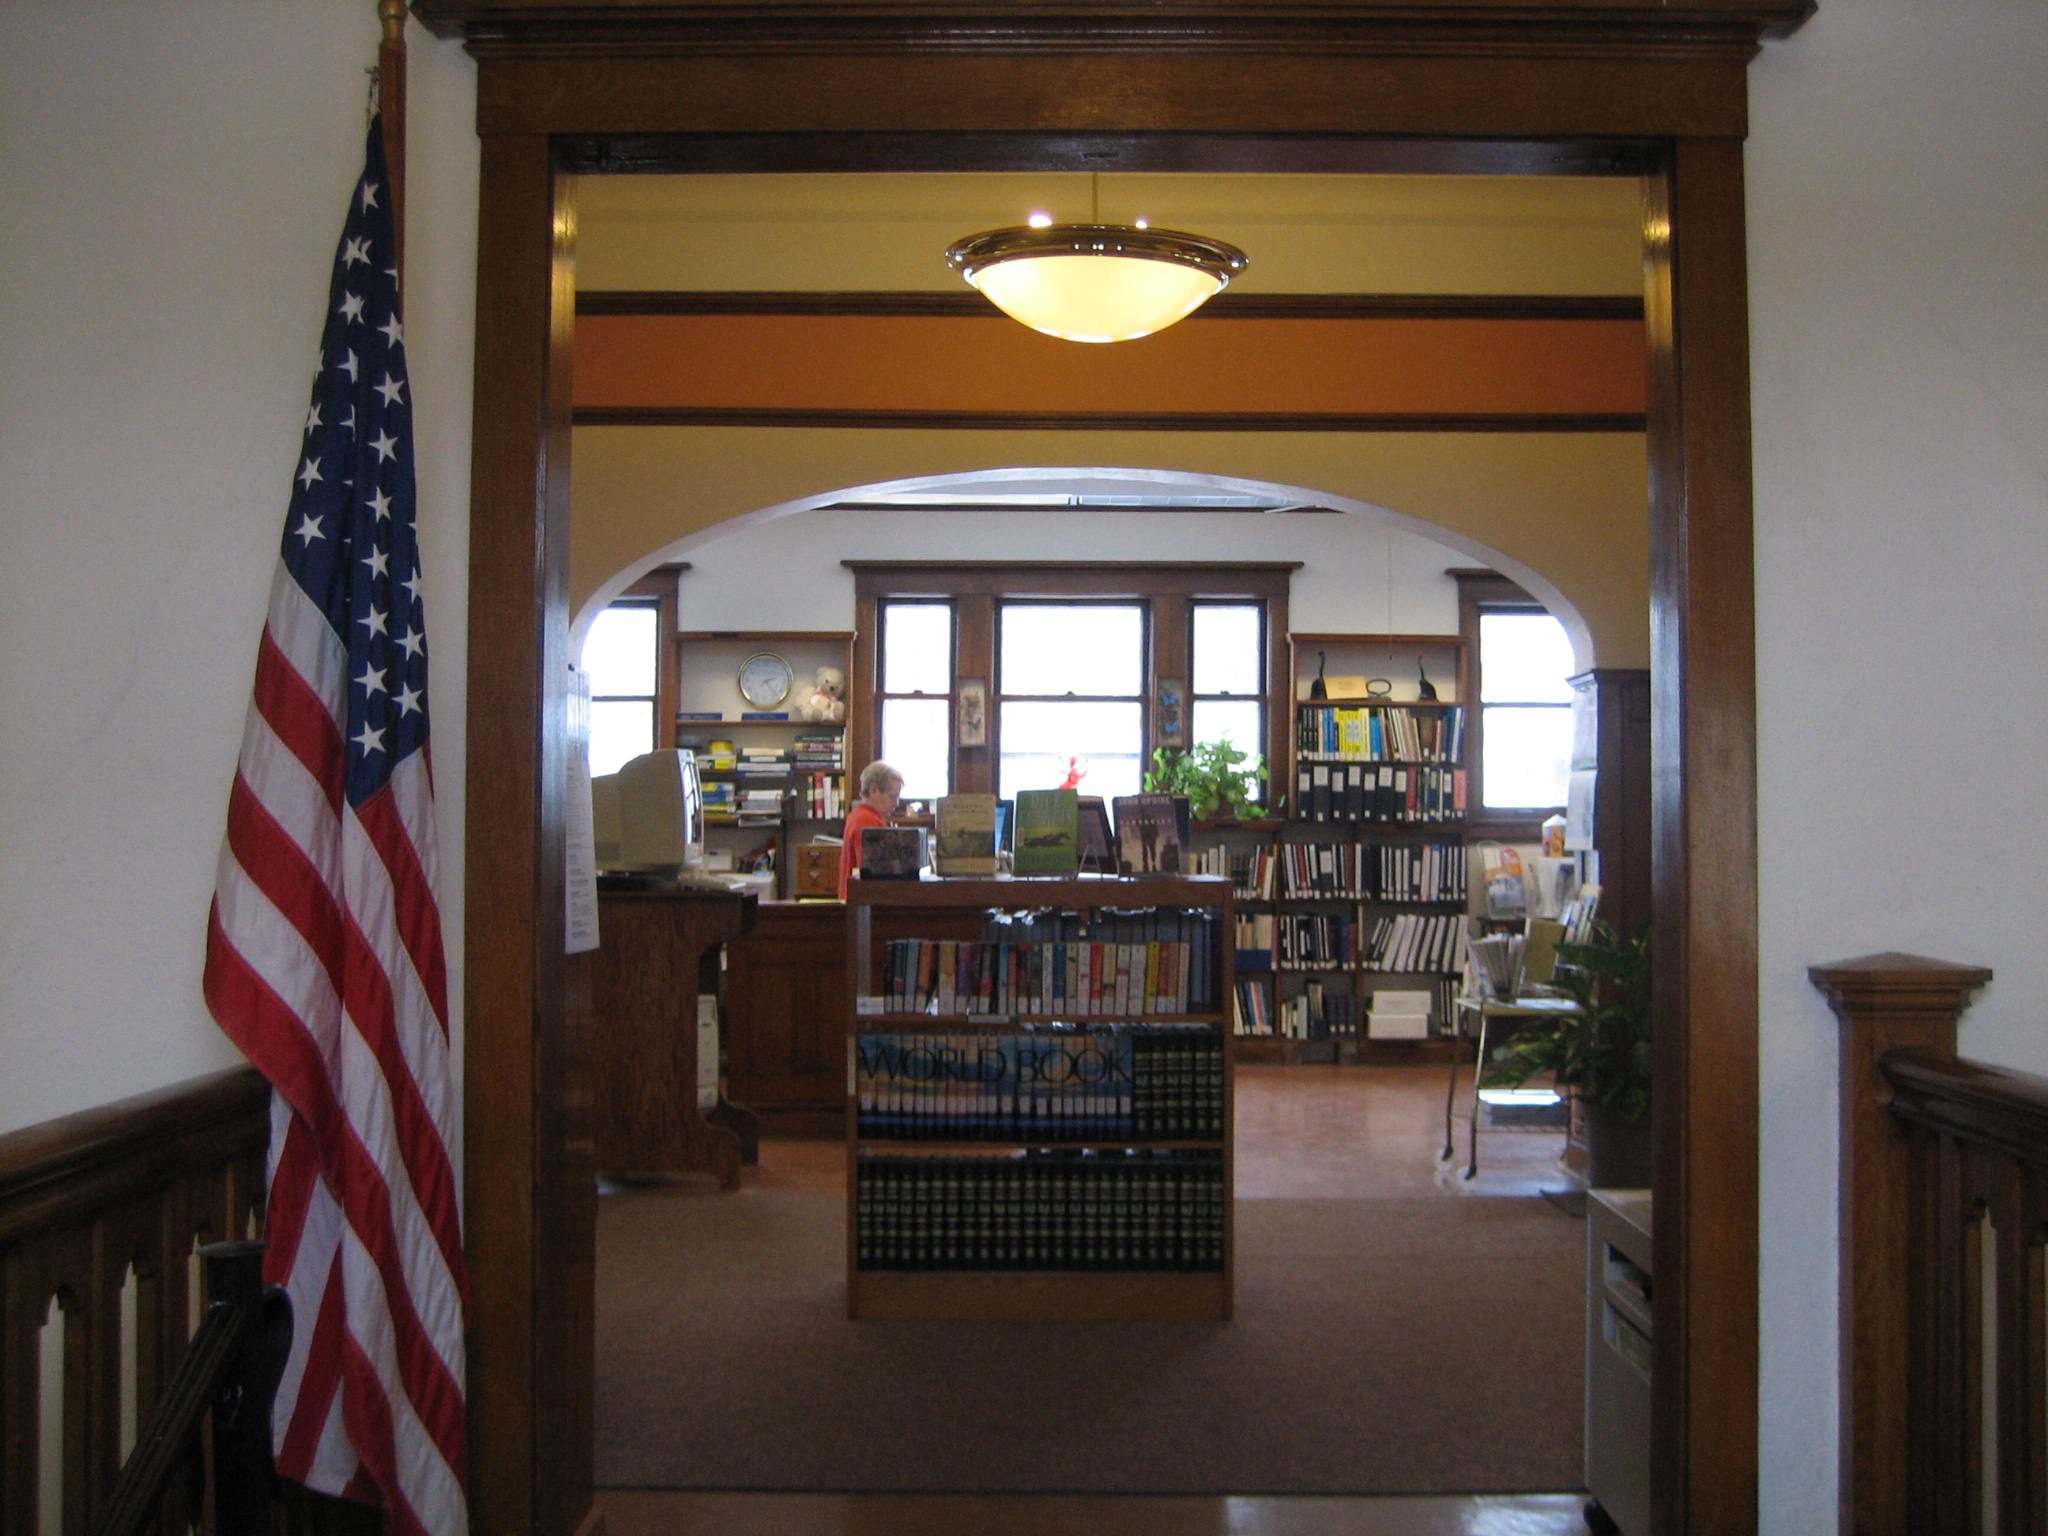 Illinois ogle county polo - File Ogle County Polo Il Buffalo Library4 Jpg